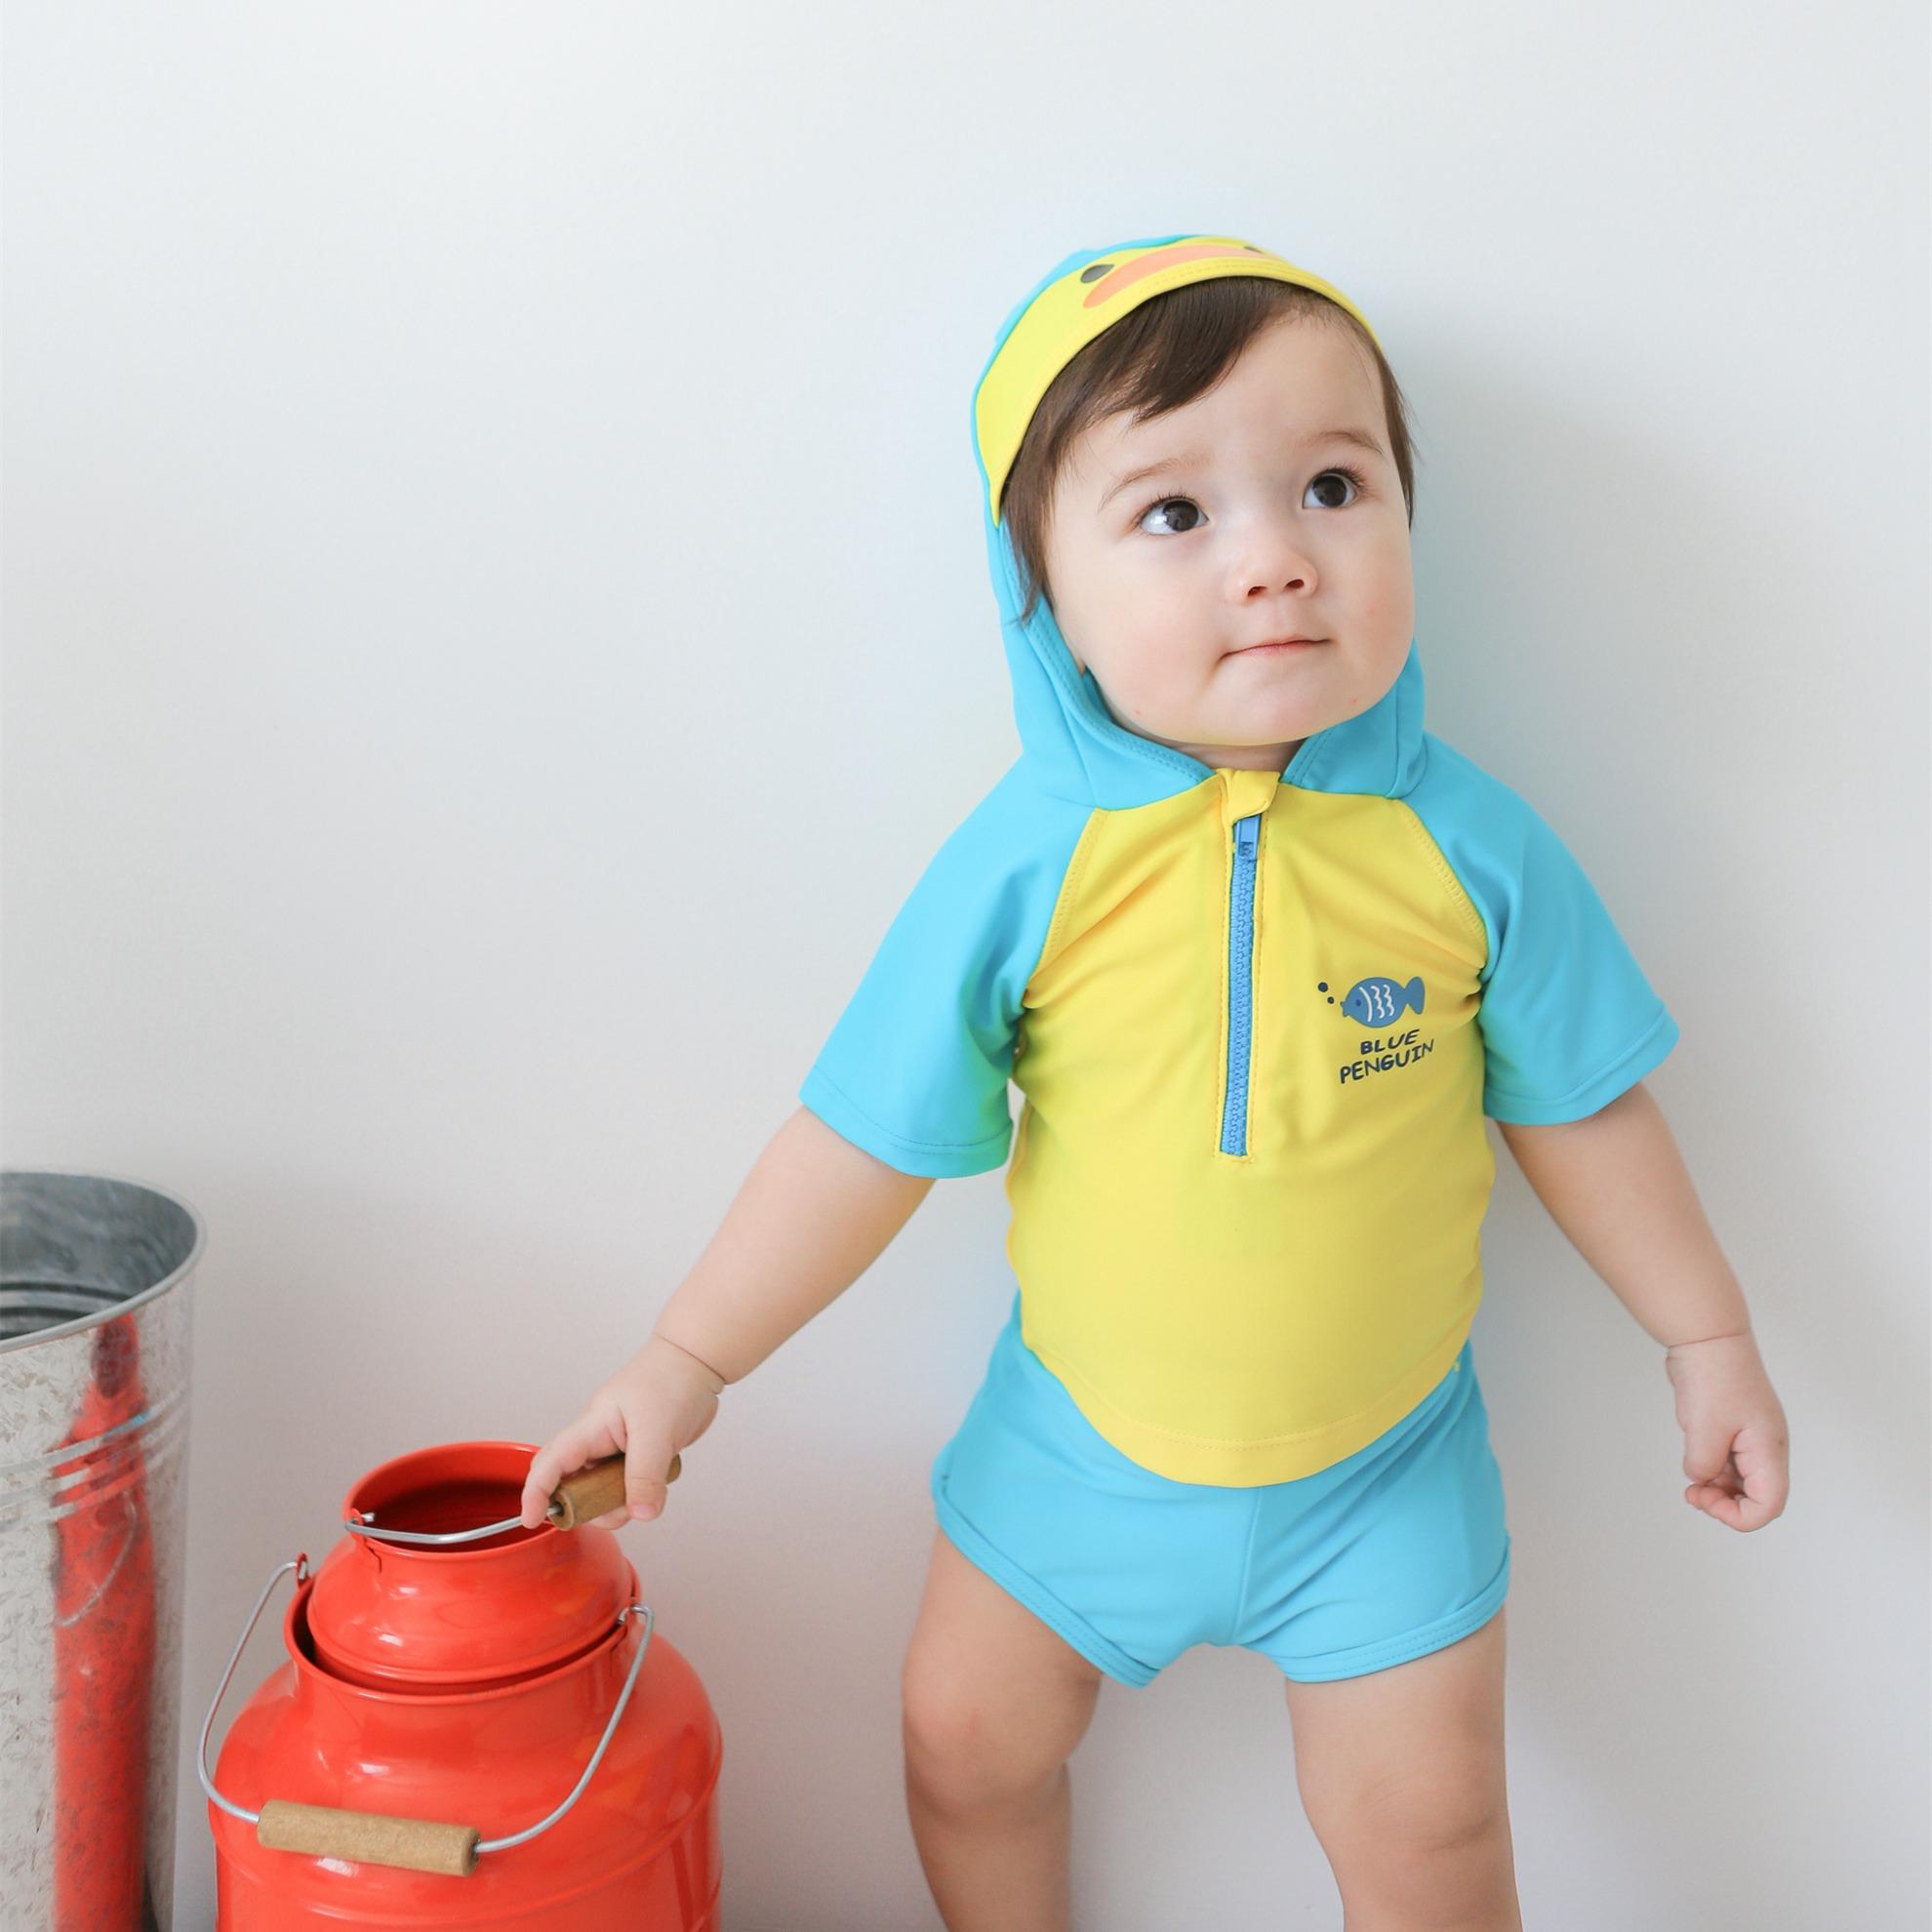 Детские [分体泳衣] на мальчика на младенца [可爱防晒泳装] комплект [1小童2-3岁幼儿] детские [游泳衣]